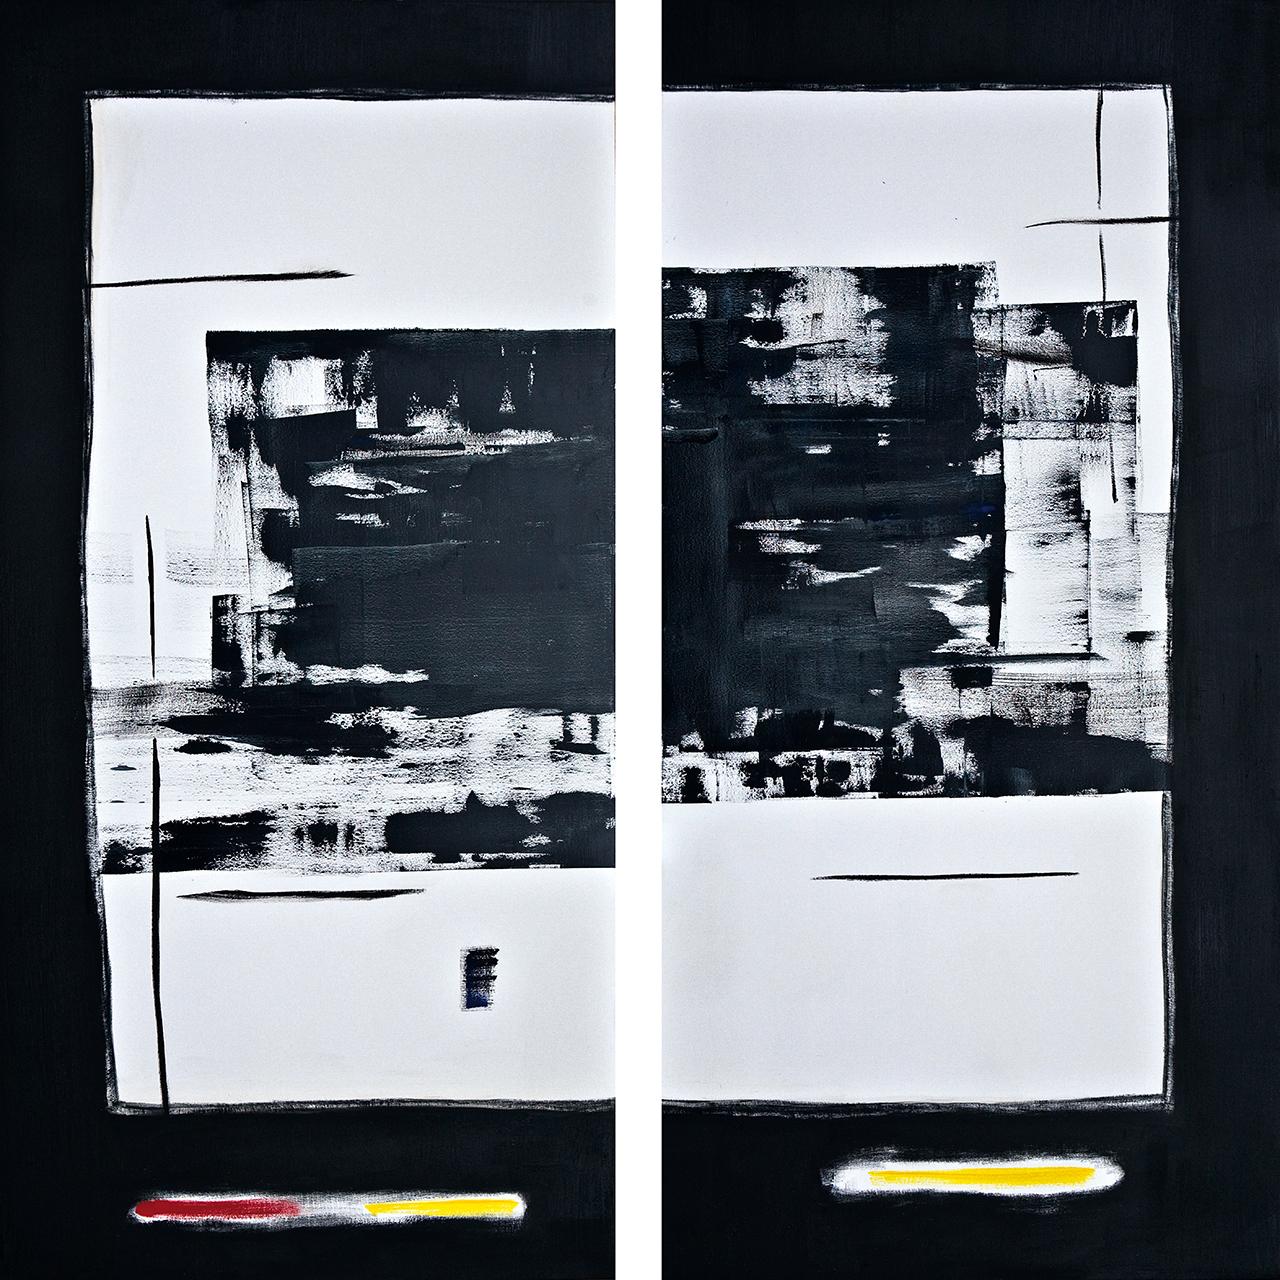 Post Nuclear Winterscenario no.1 (2015) olieverf op linnen (2 luik) 300 x 300cm